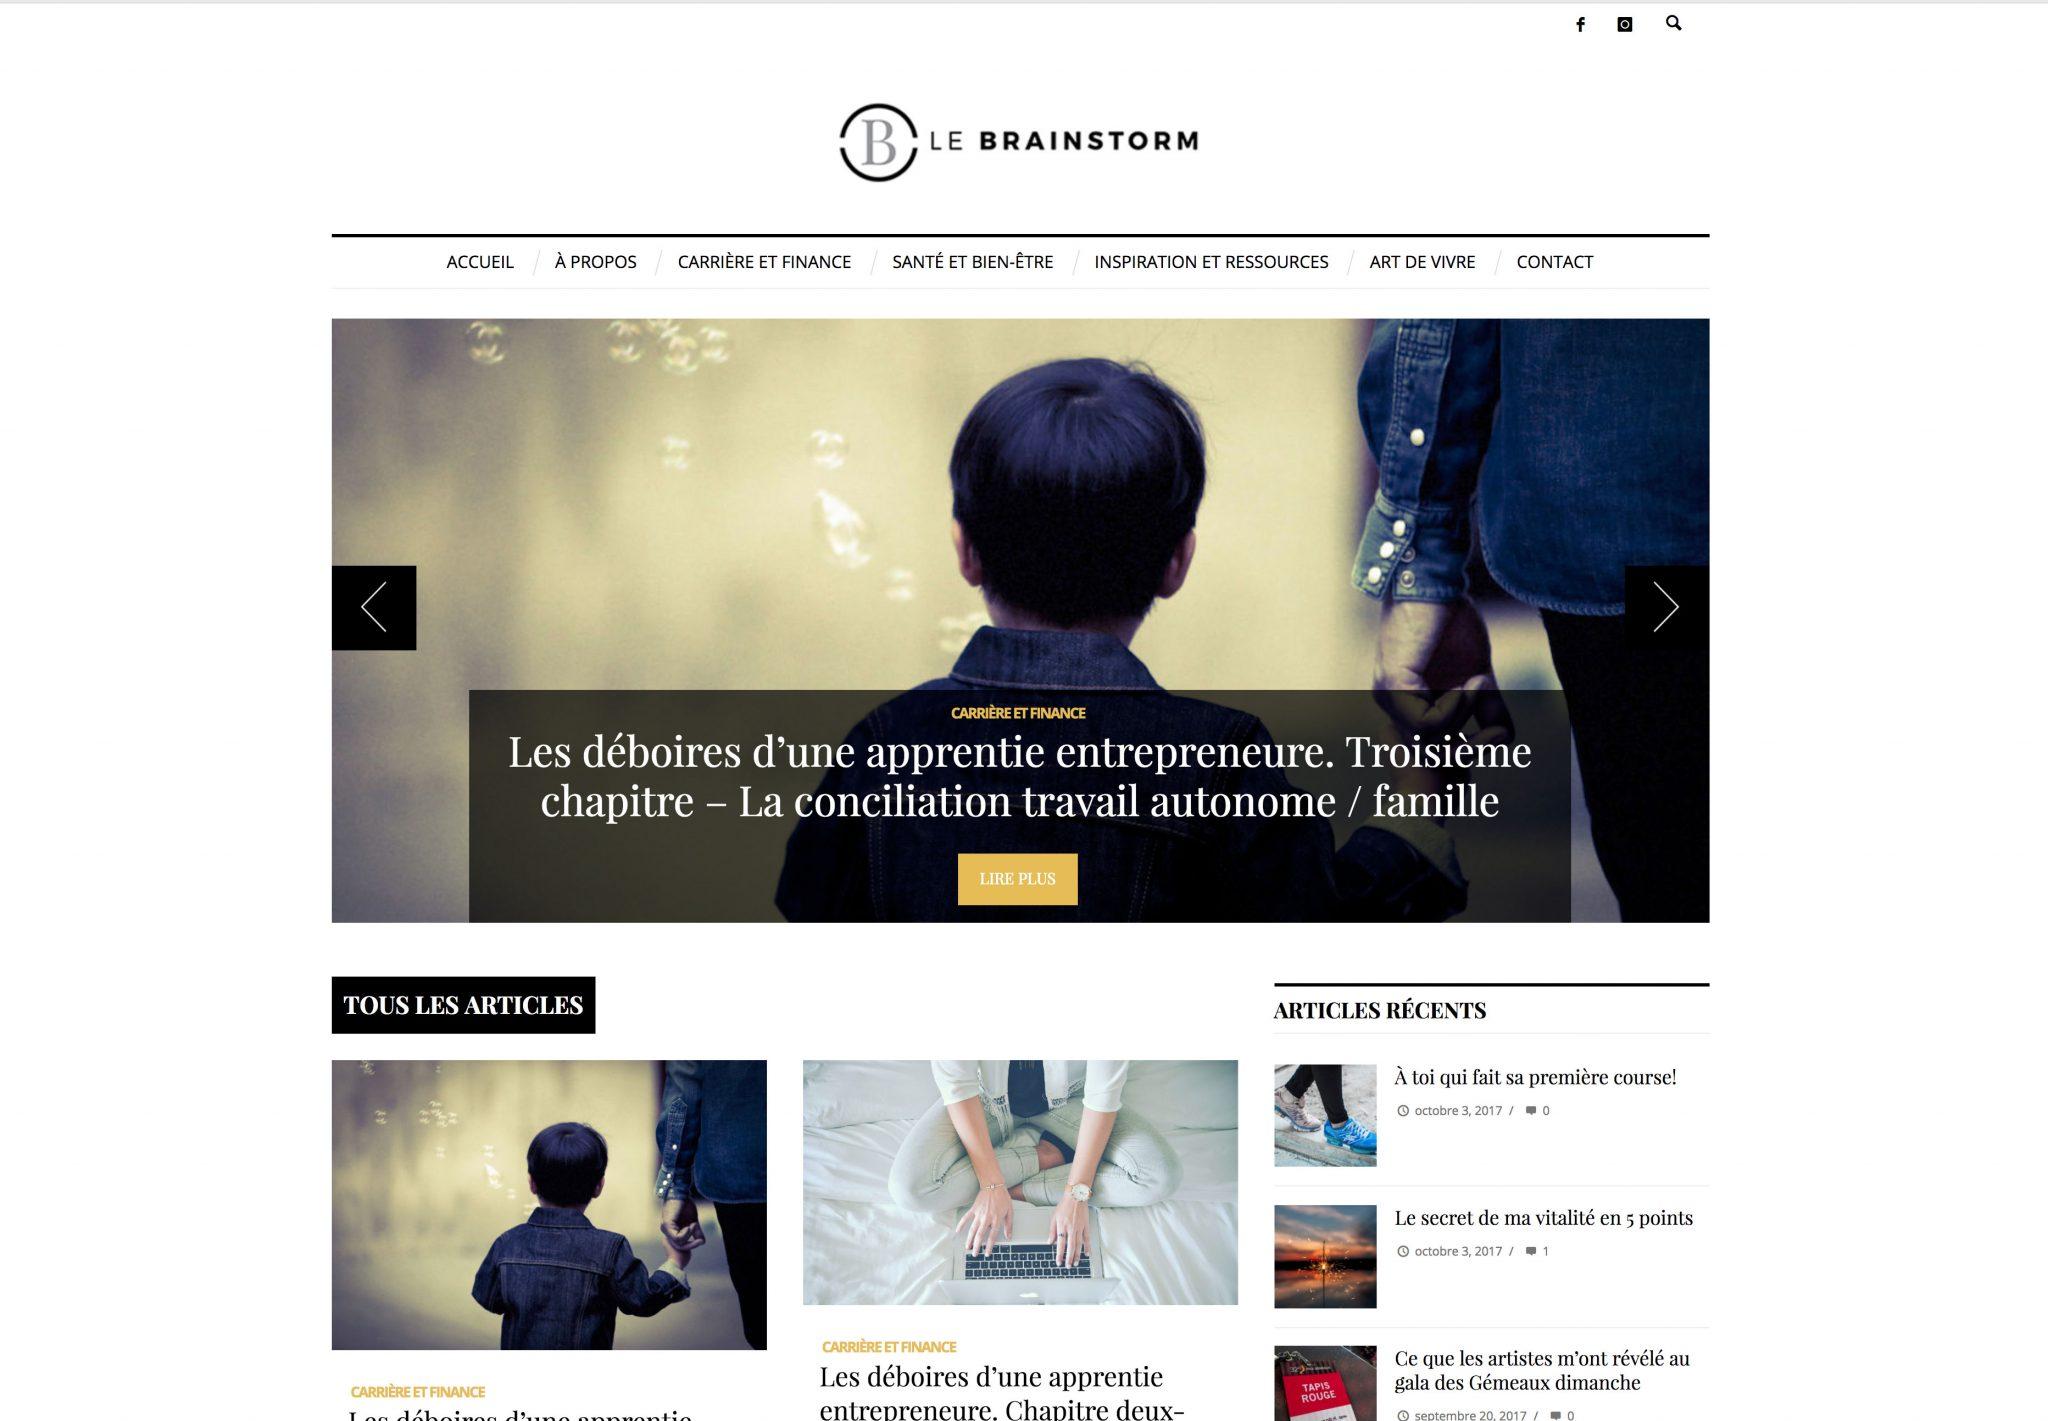 brainstorm_0004_Layer 2